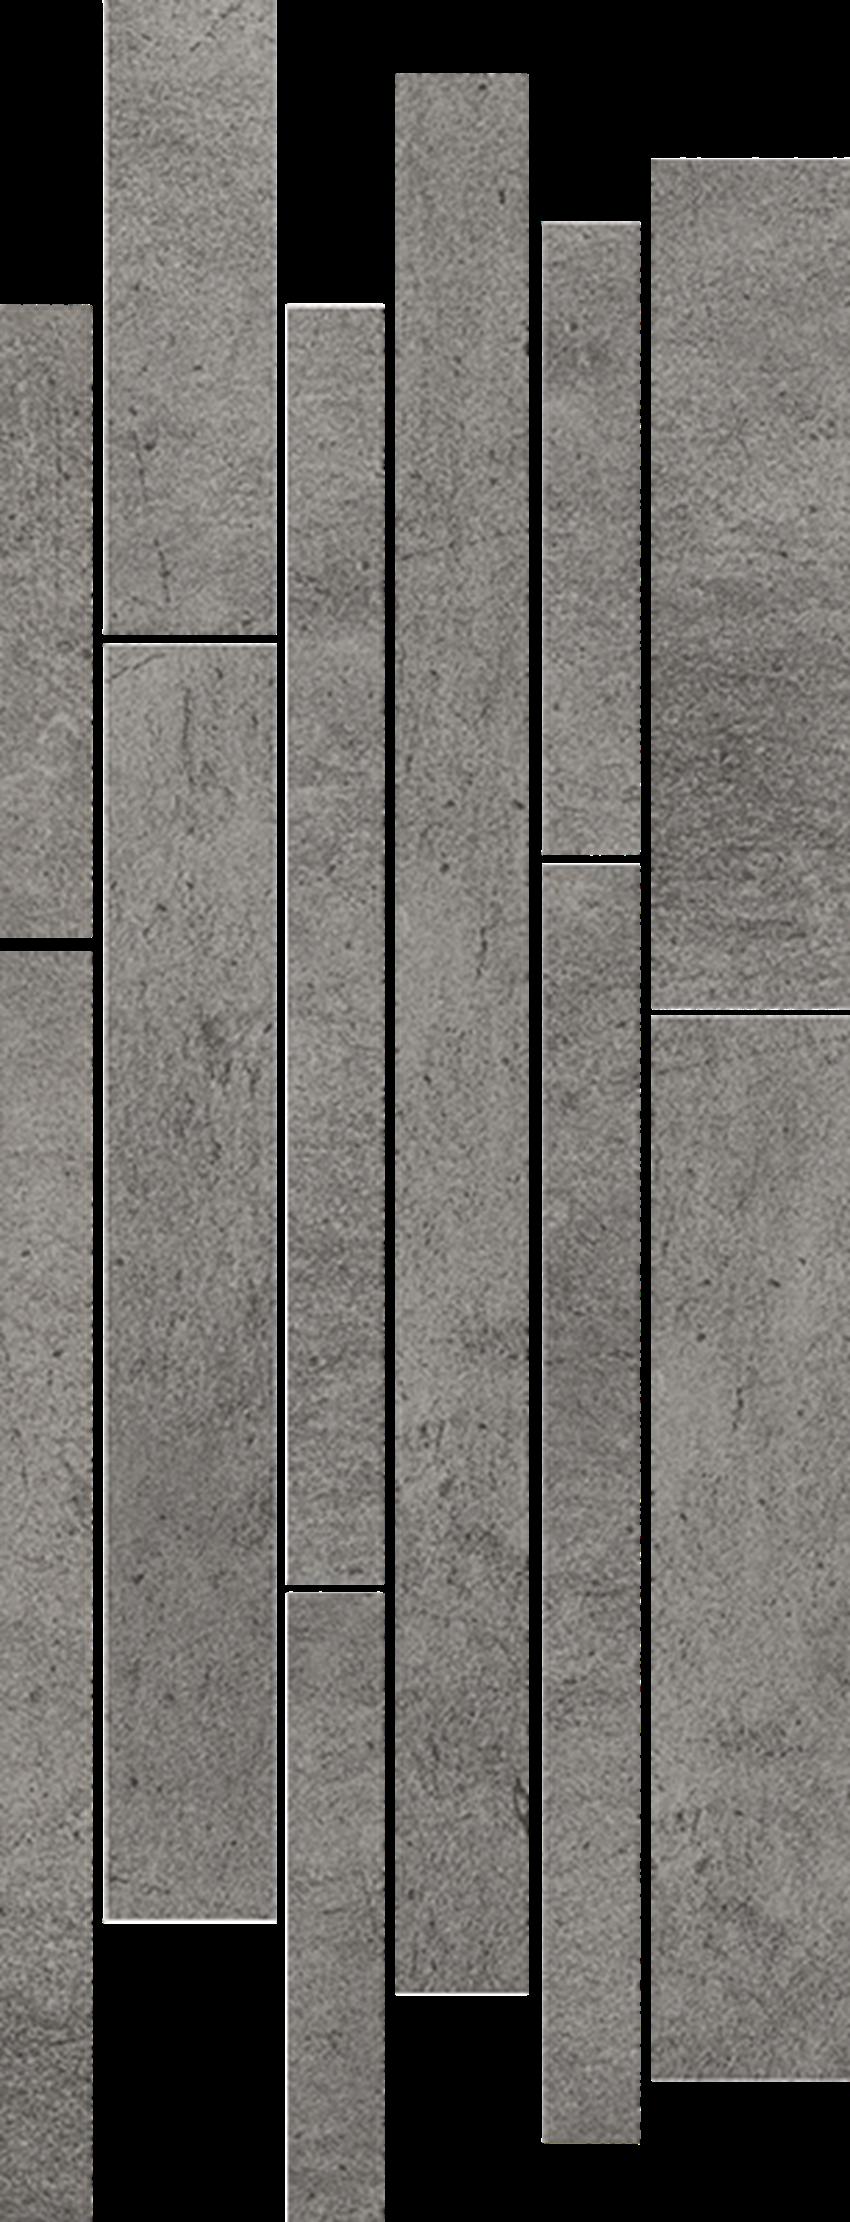 Listwa 20x52 cm Paradyż Taranto Grys Listwa Mix Paski Mat